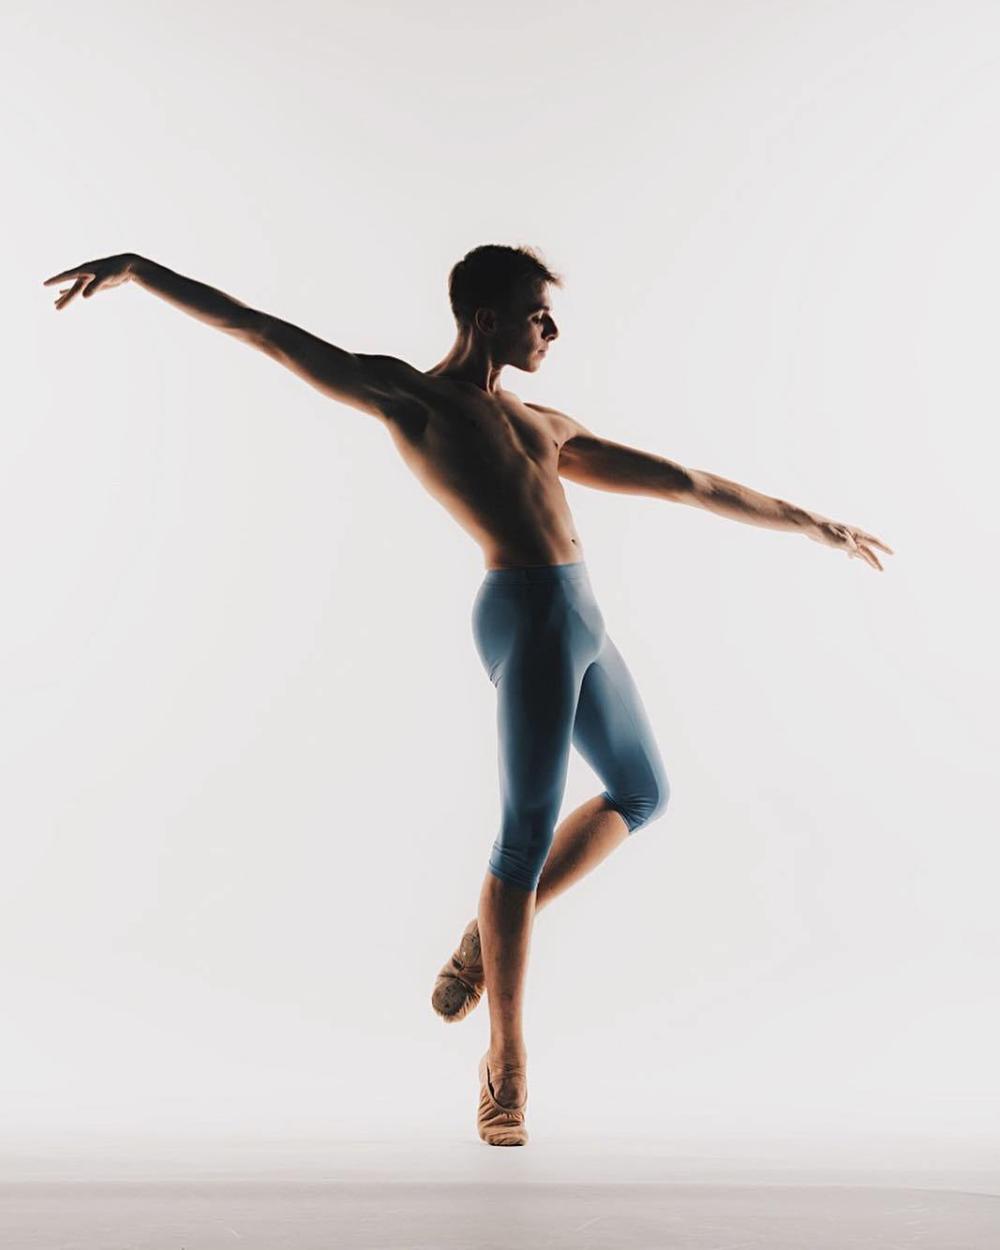 Lara Spencers Prince George ballet controversy: These ballerinos make big bucks | Prince